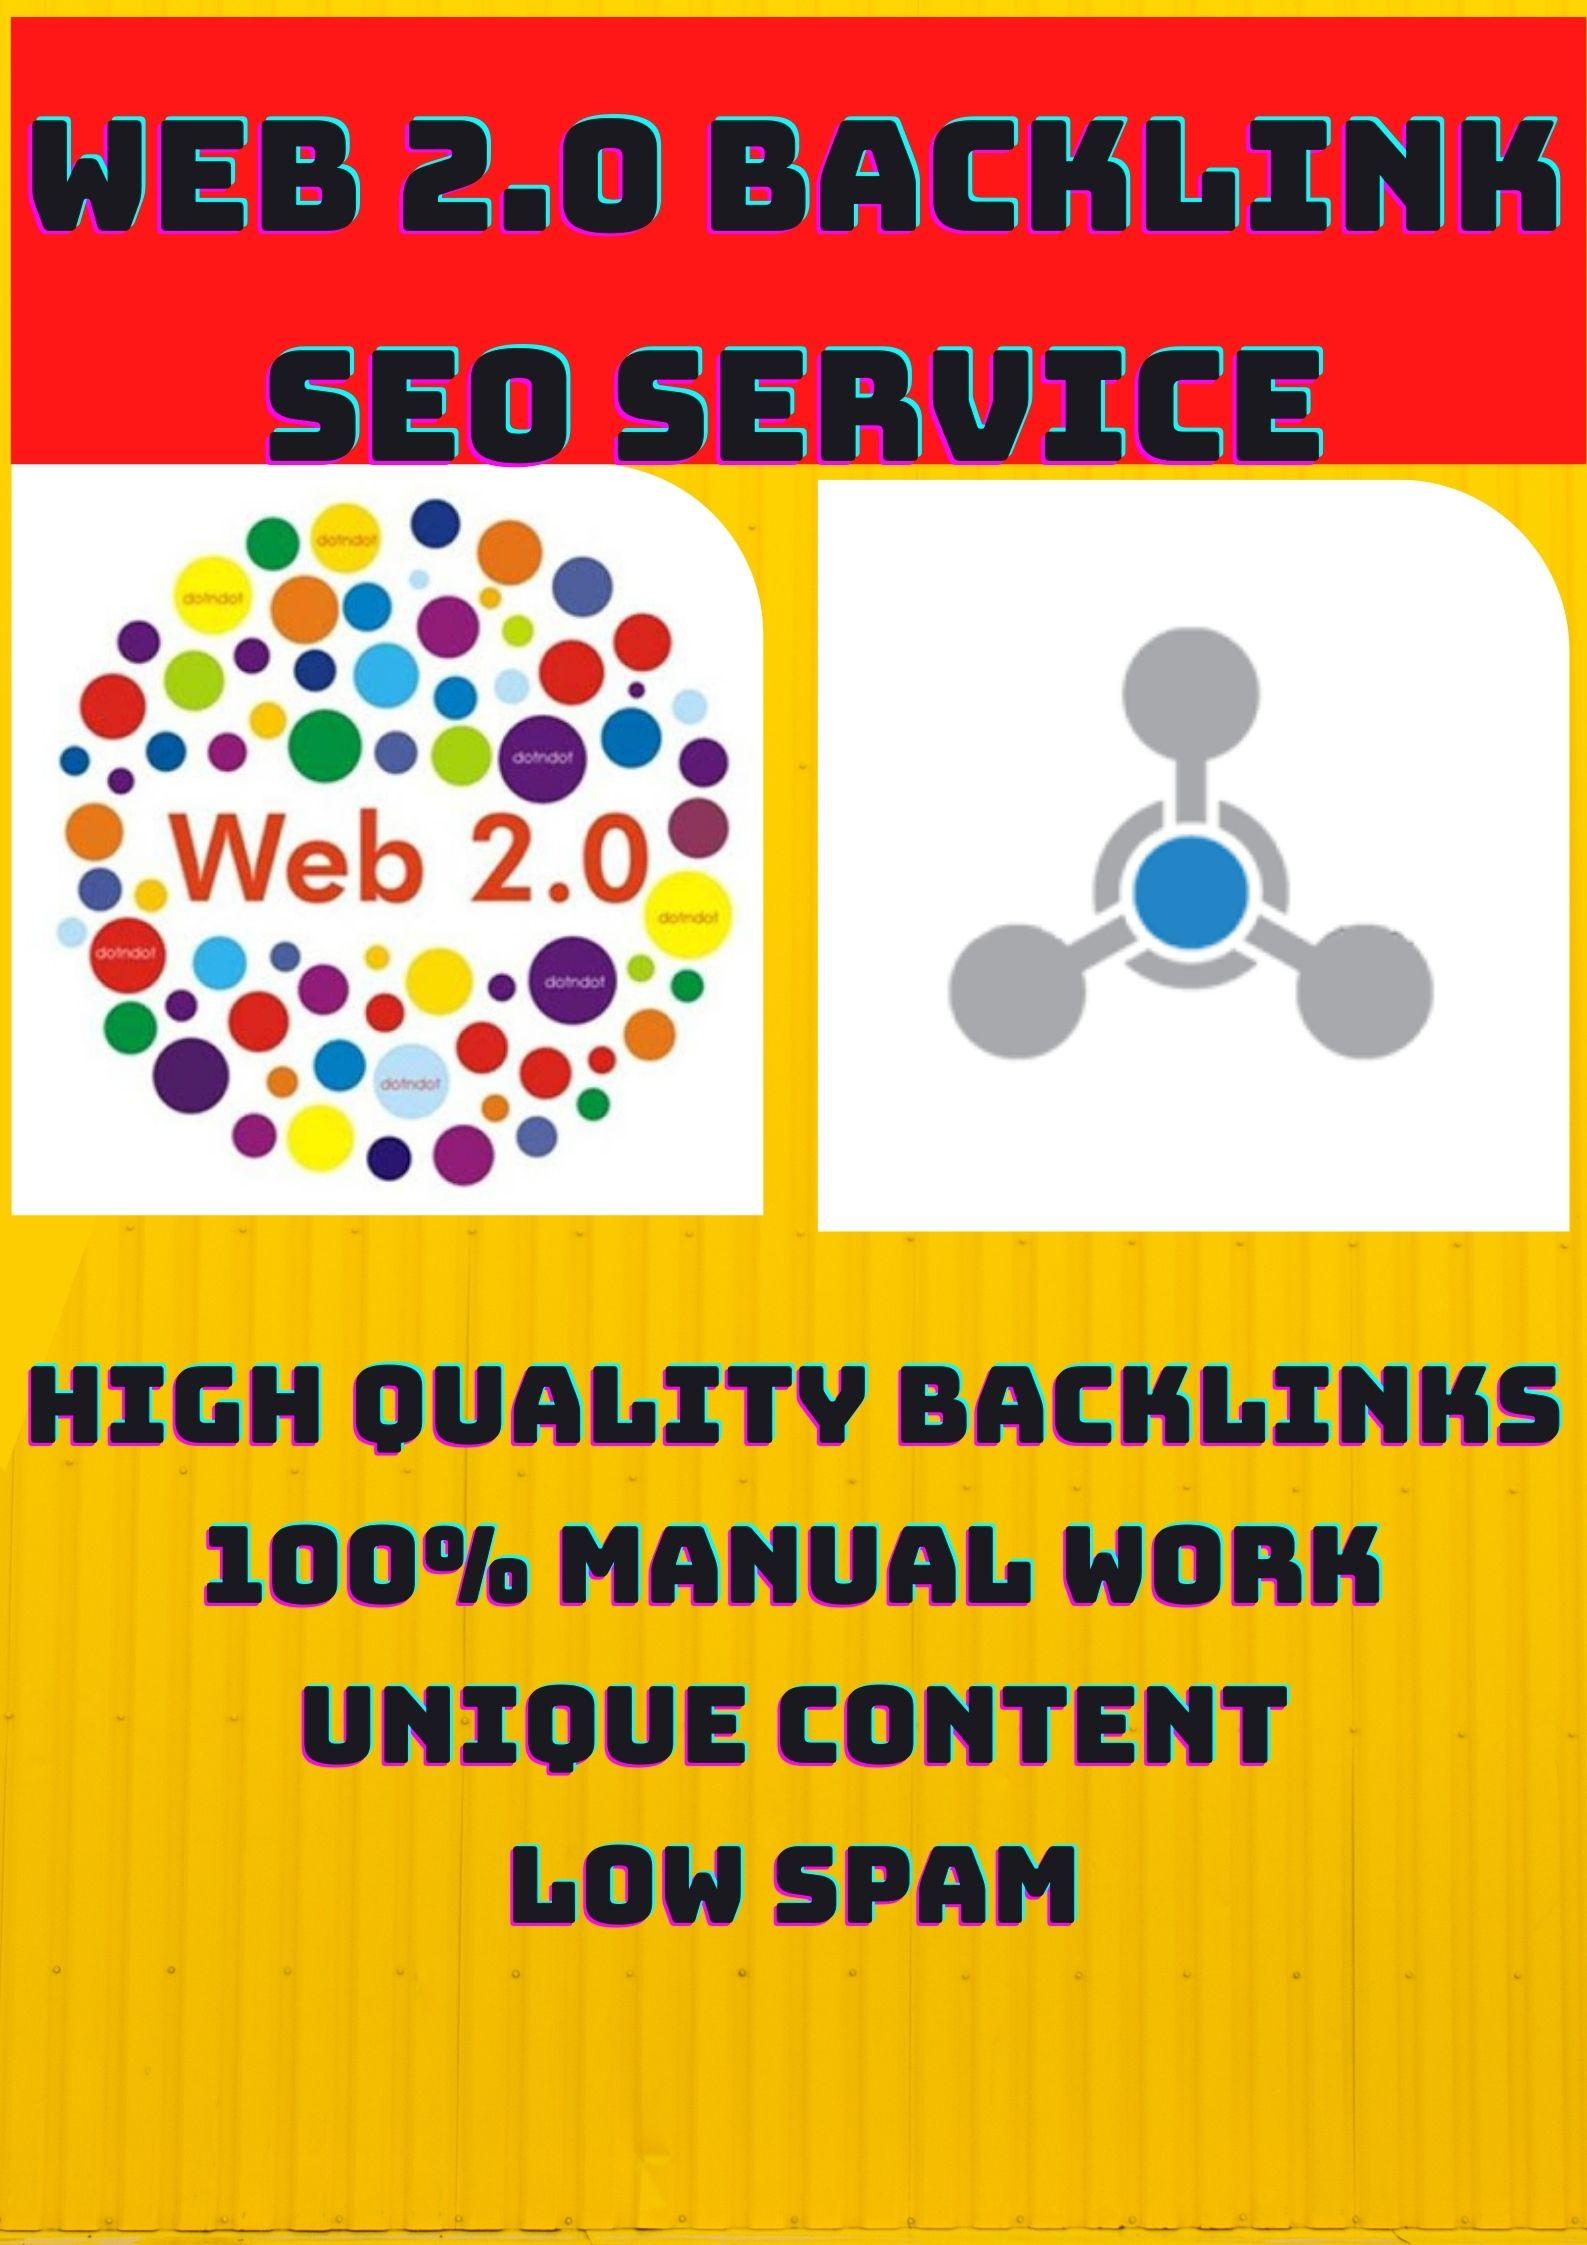 I create High Quality Web2.0 sub-domain Blogs with proper image